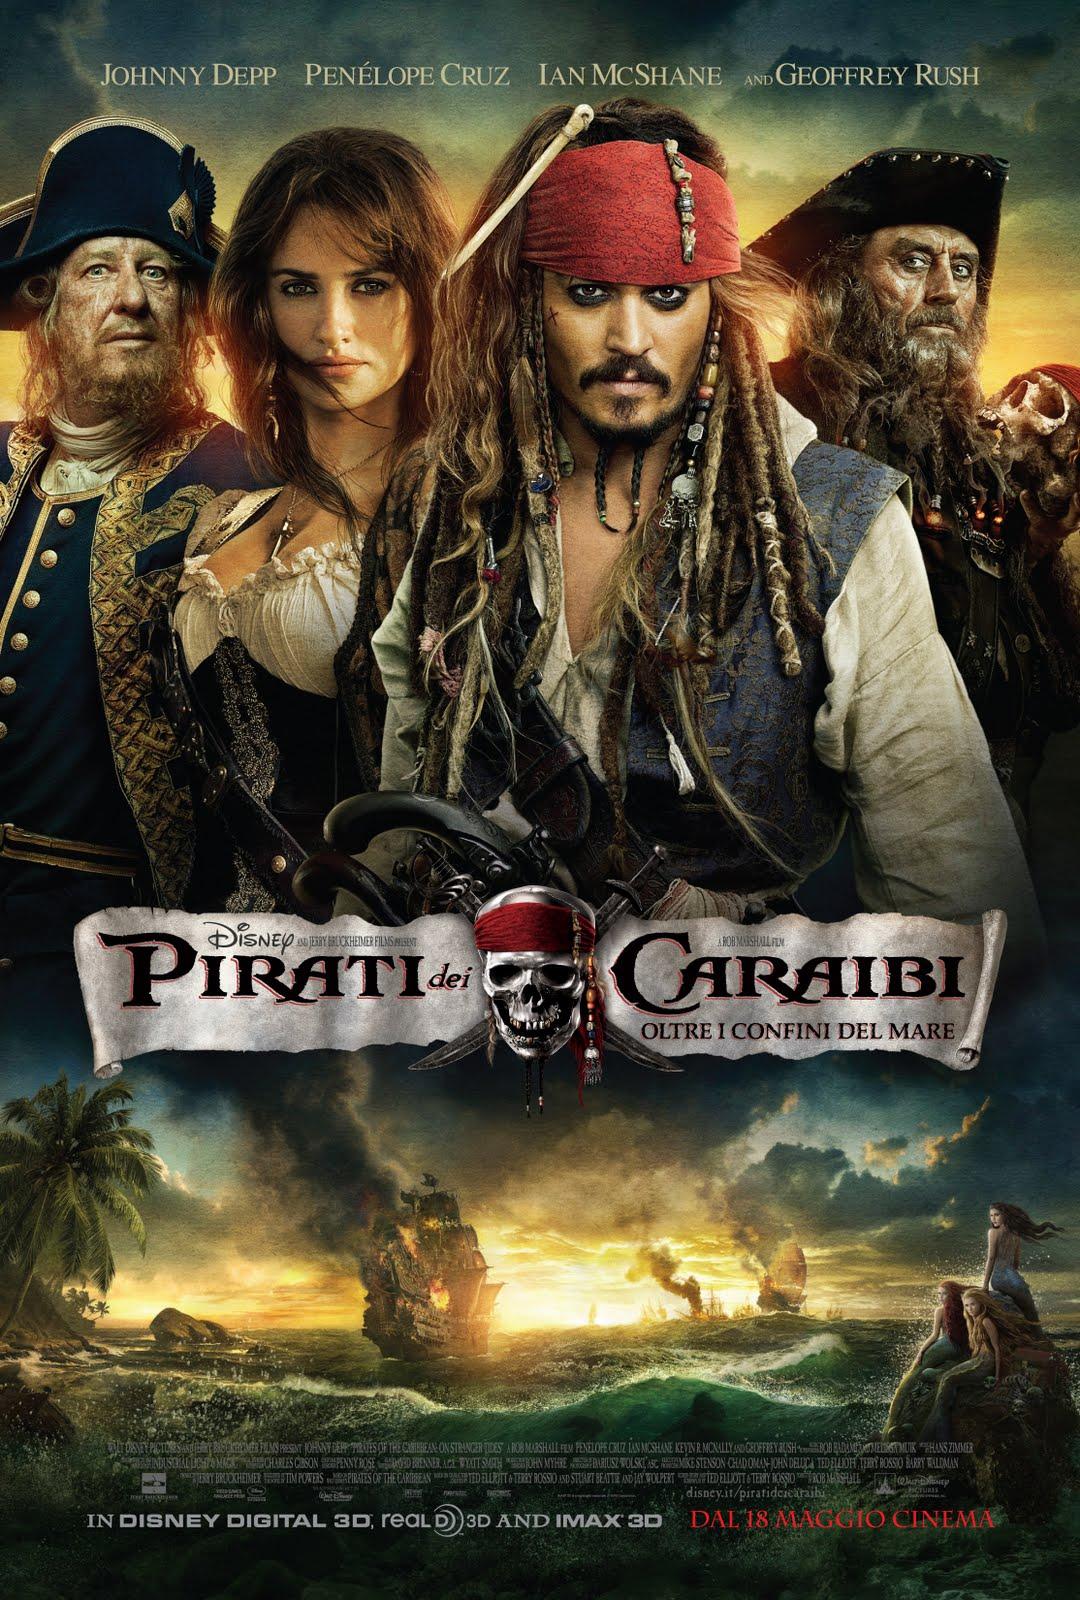 Pirati Dei Caraibi 1 Pirati Dei Caraibi Oltre i